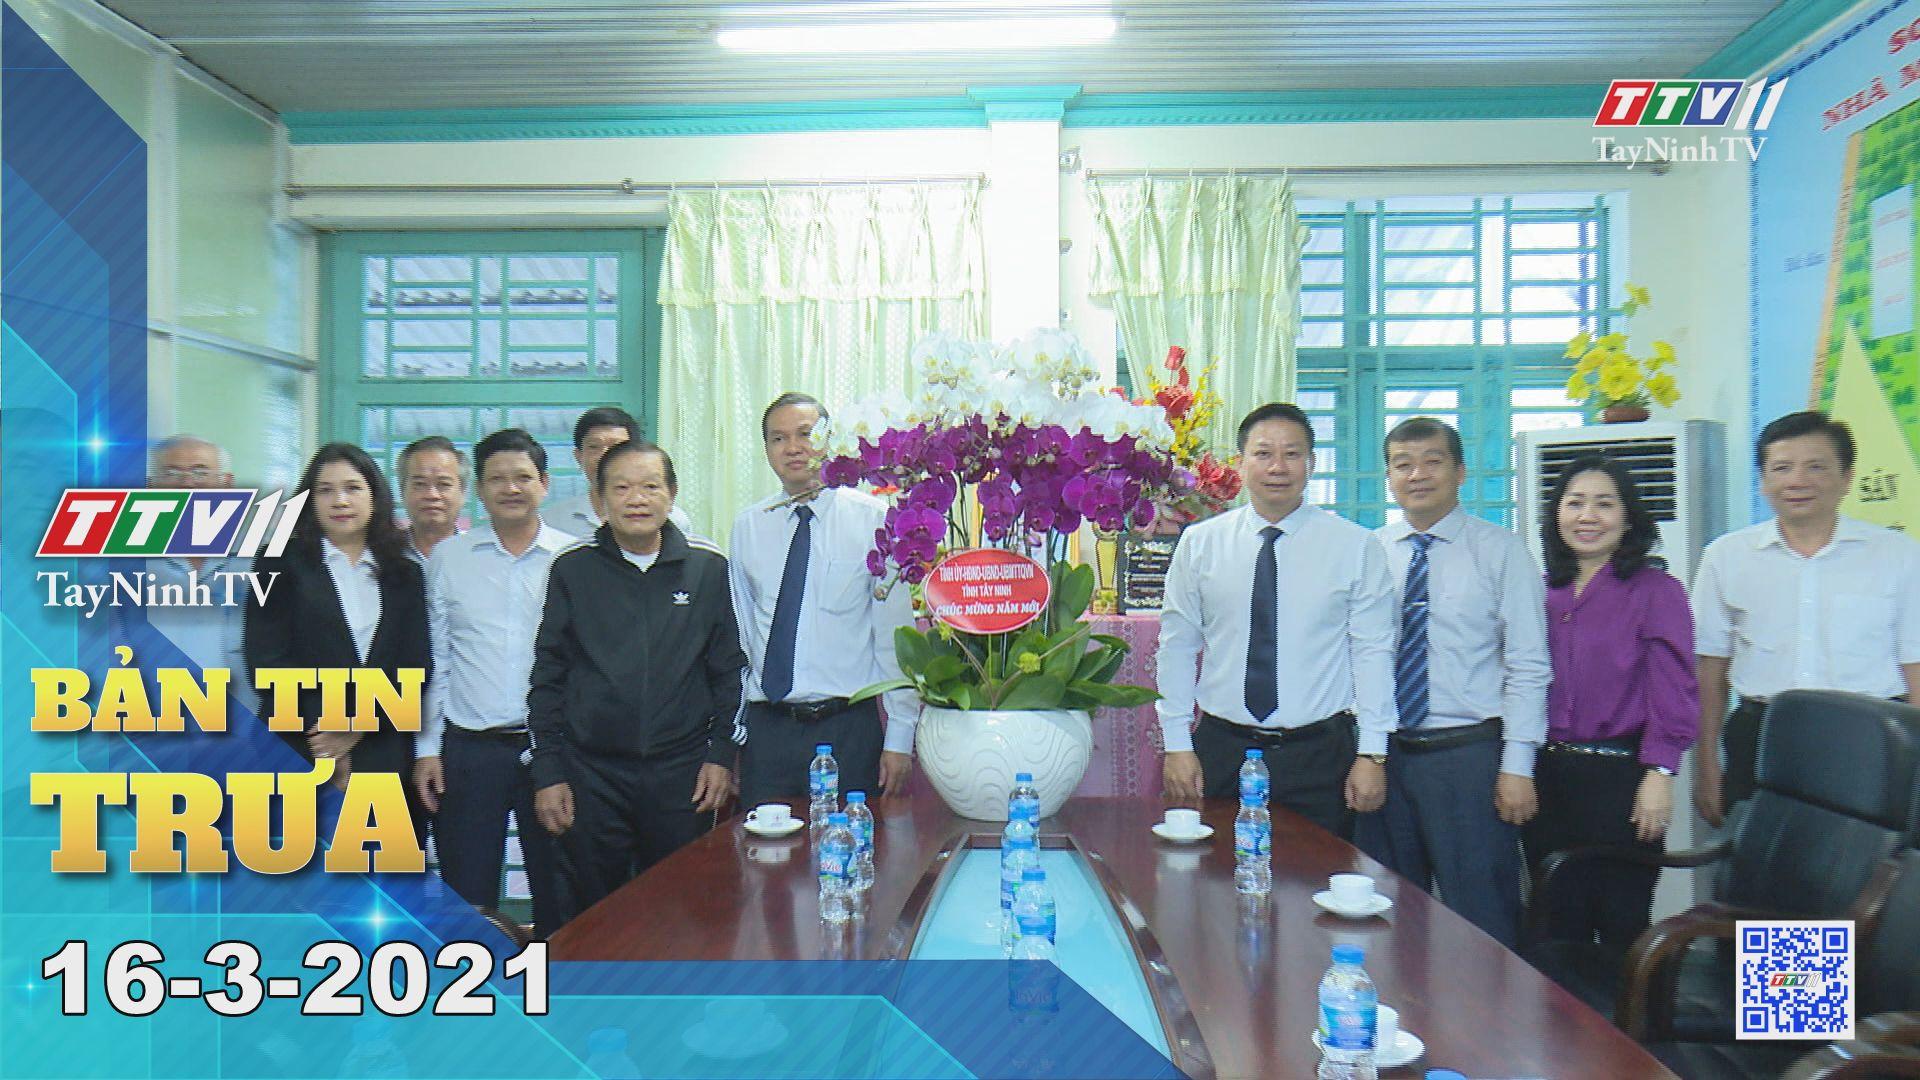 Bản tin trưa 16-3-2021 | Tin tức hôm nay | TayNinhTV